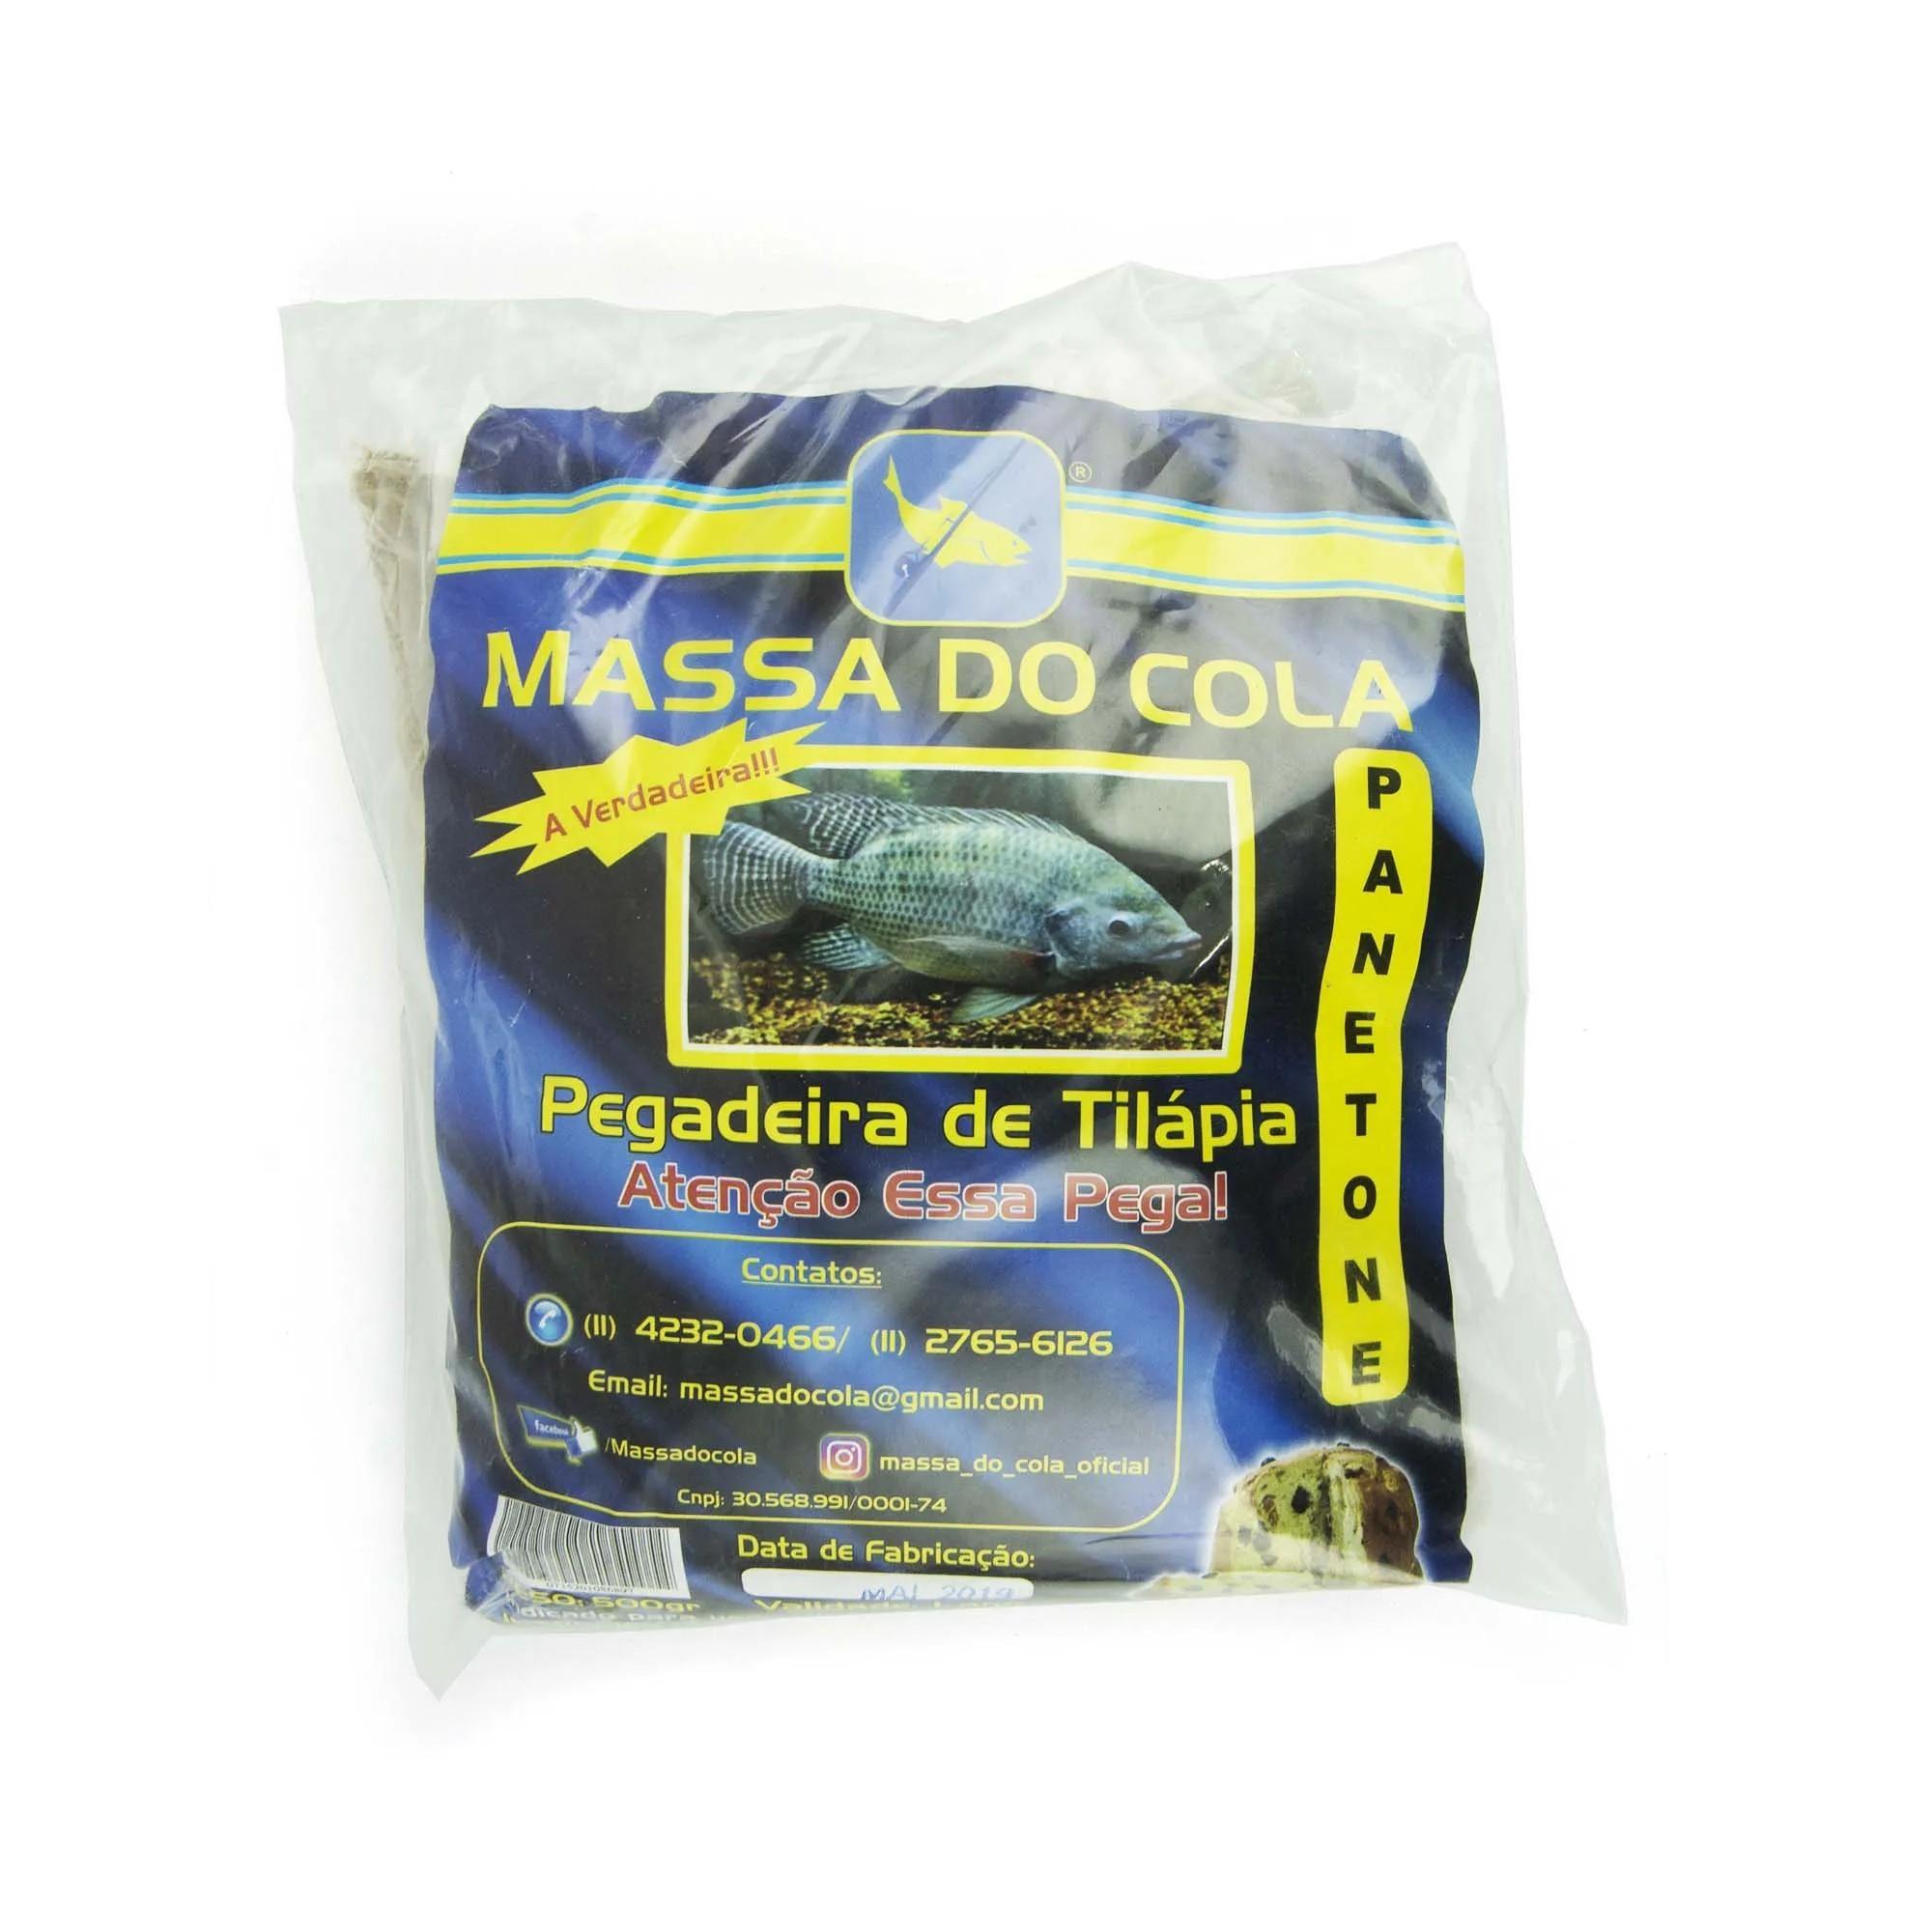 Massa para pesca Pegadeira de Tilápia - Panetone  - Artpesca